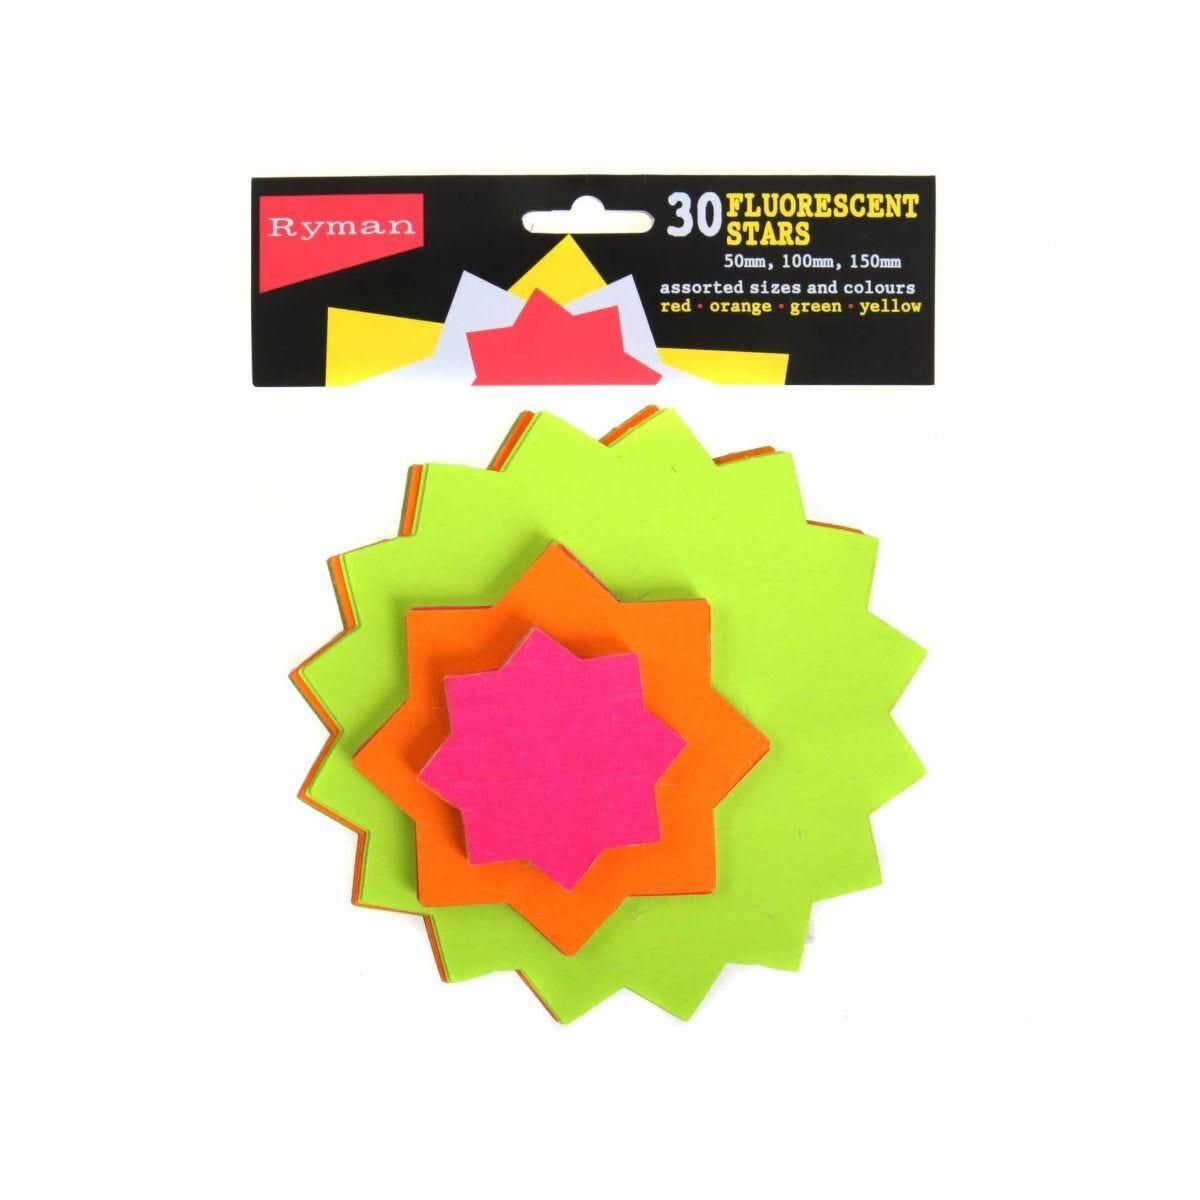 Ryman Fluorescent Stars Pack of 30